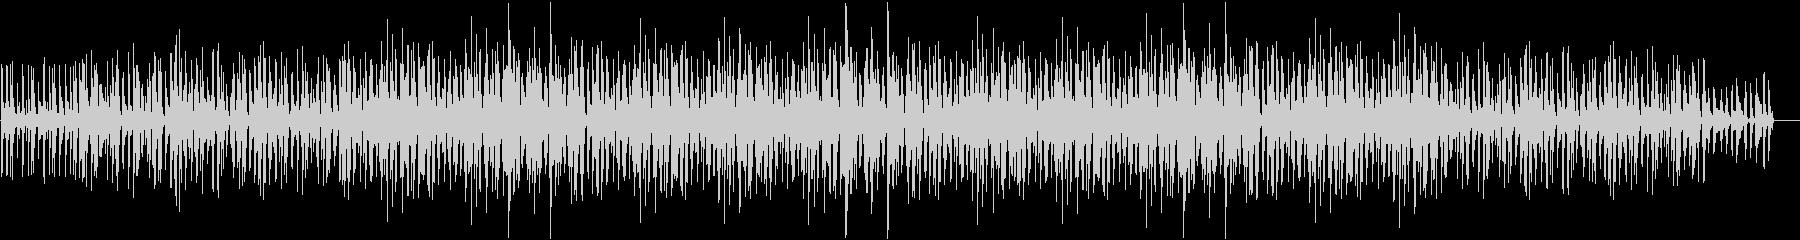 152bpm、Bb-Maj、ジャズ調の未再生の波形